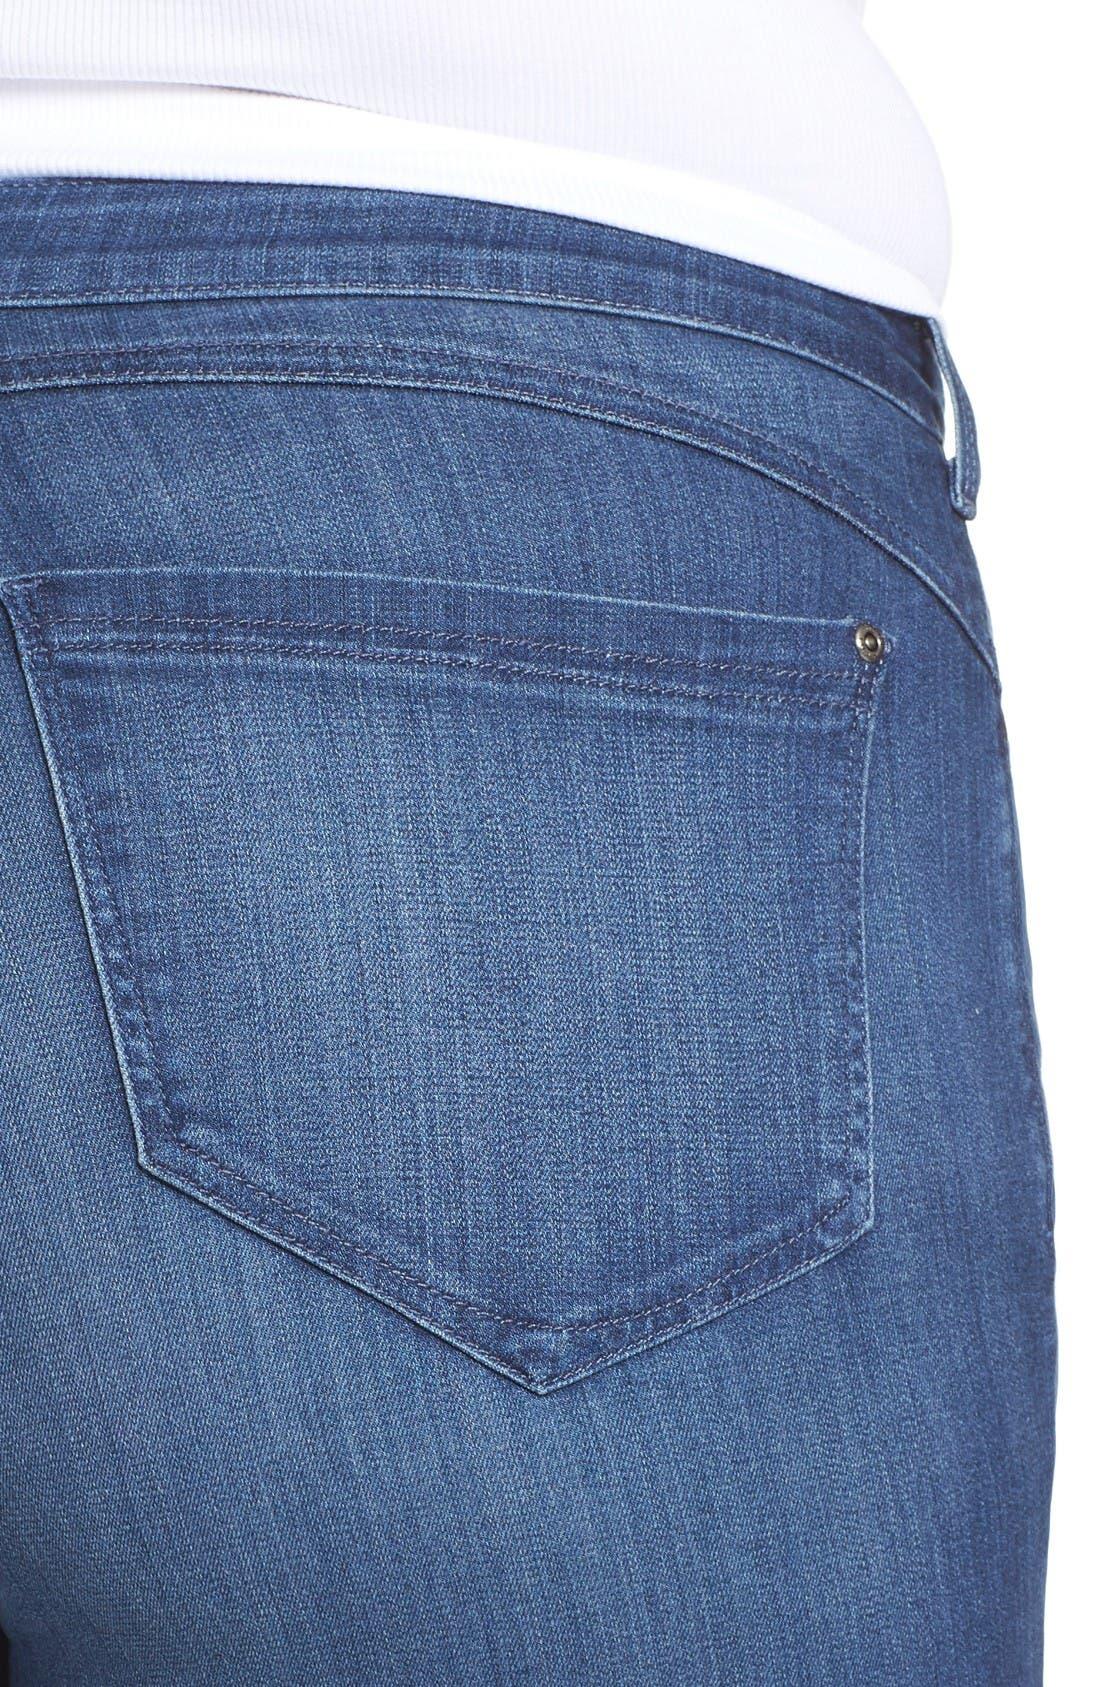 'Ami' Stretch Skinny Jeans,                             Alternate thumbnail 4, color,                             Nantes